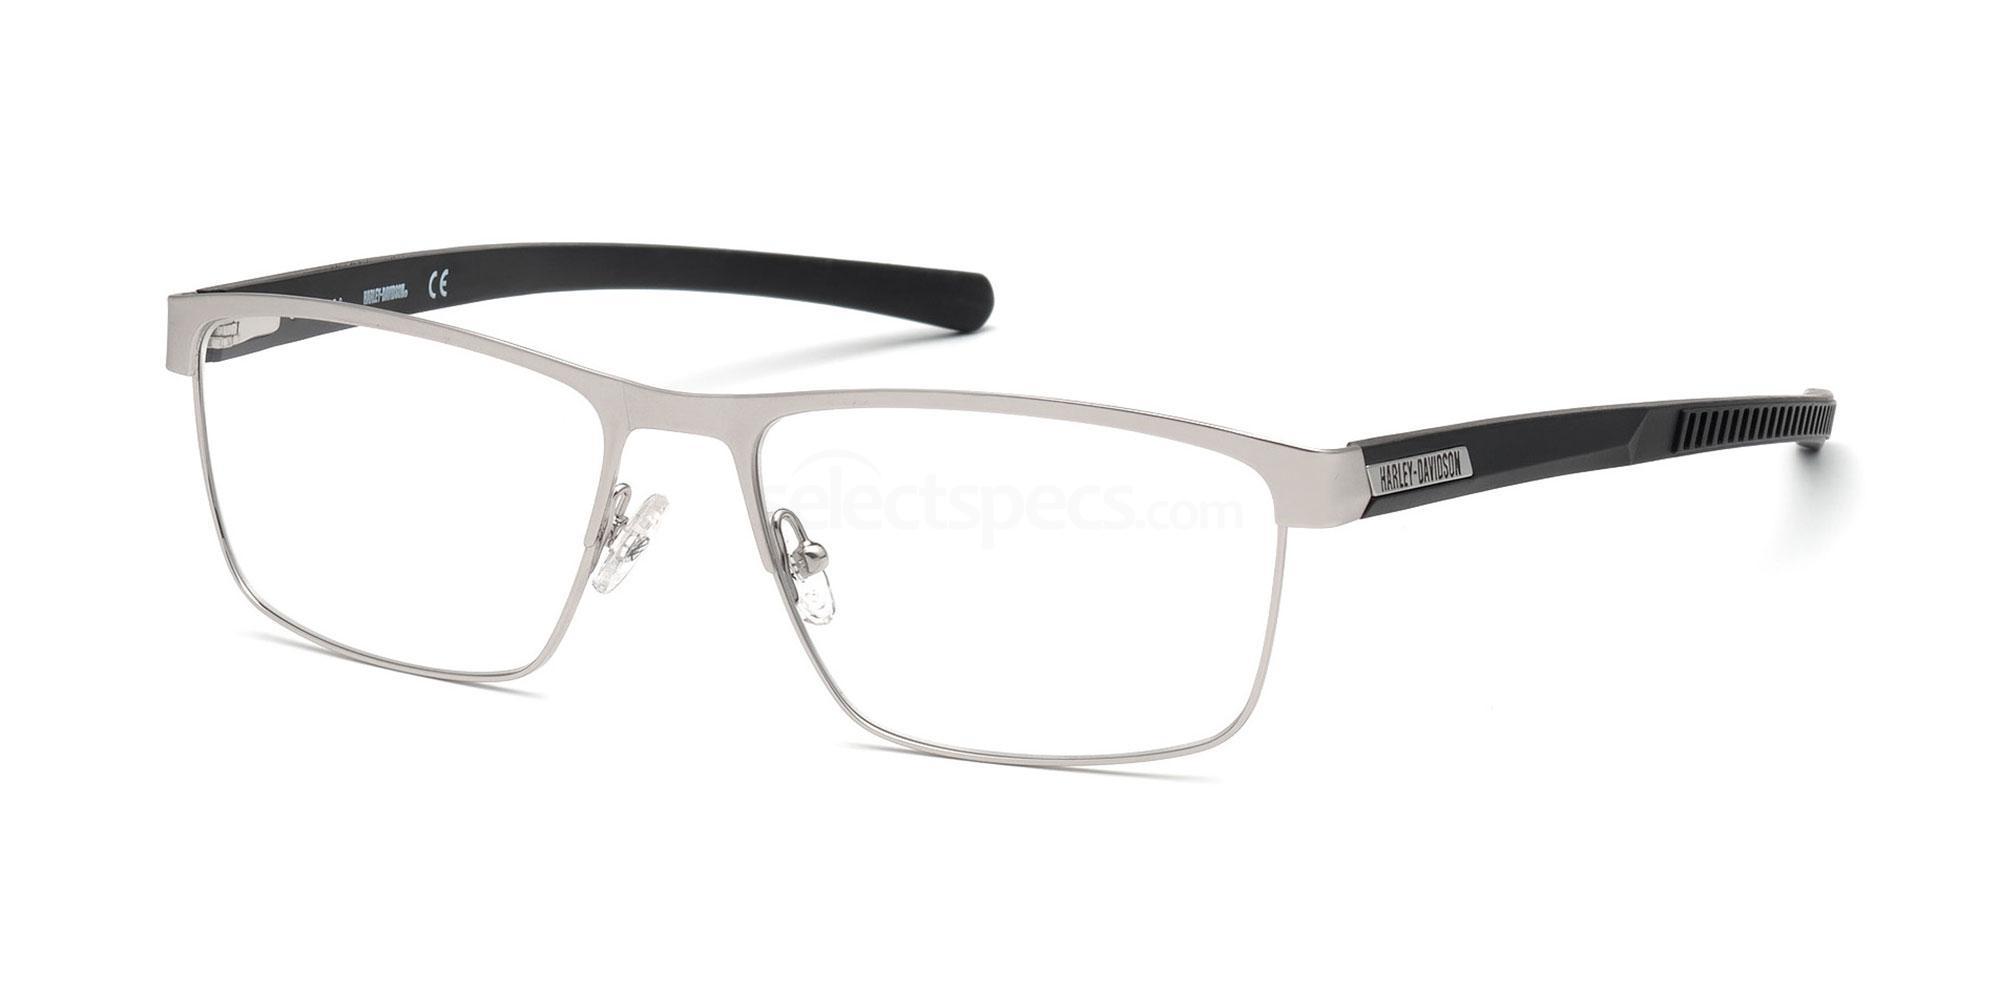 007 HD0793 Glasses, Harley Davidson